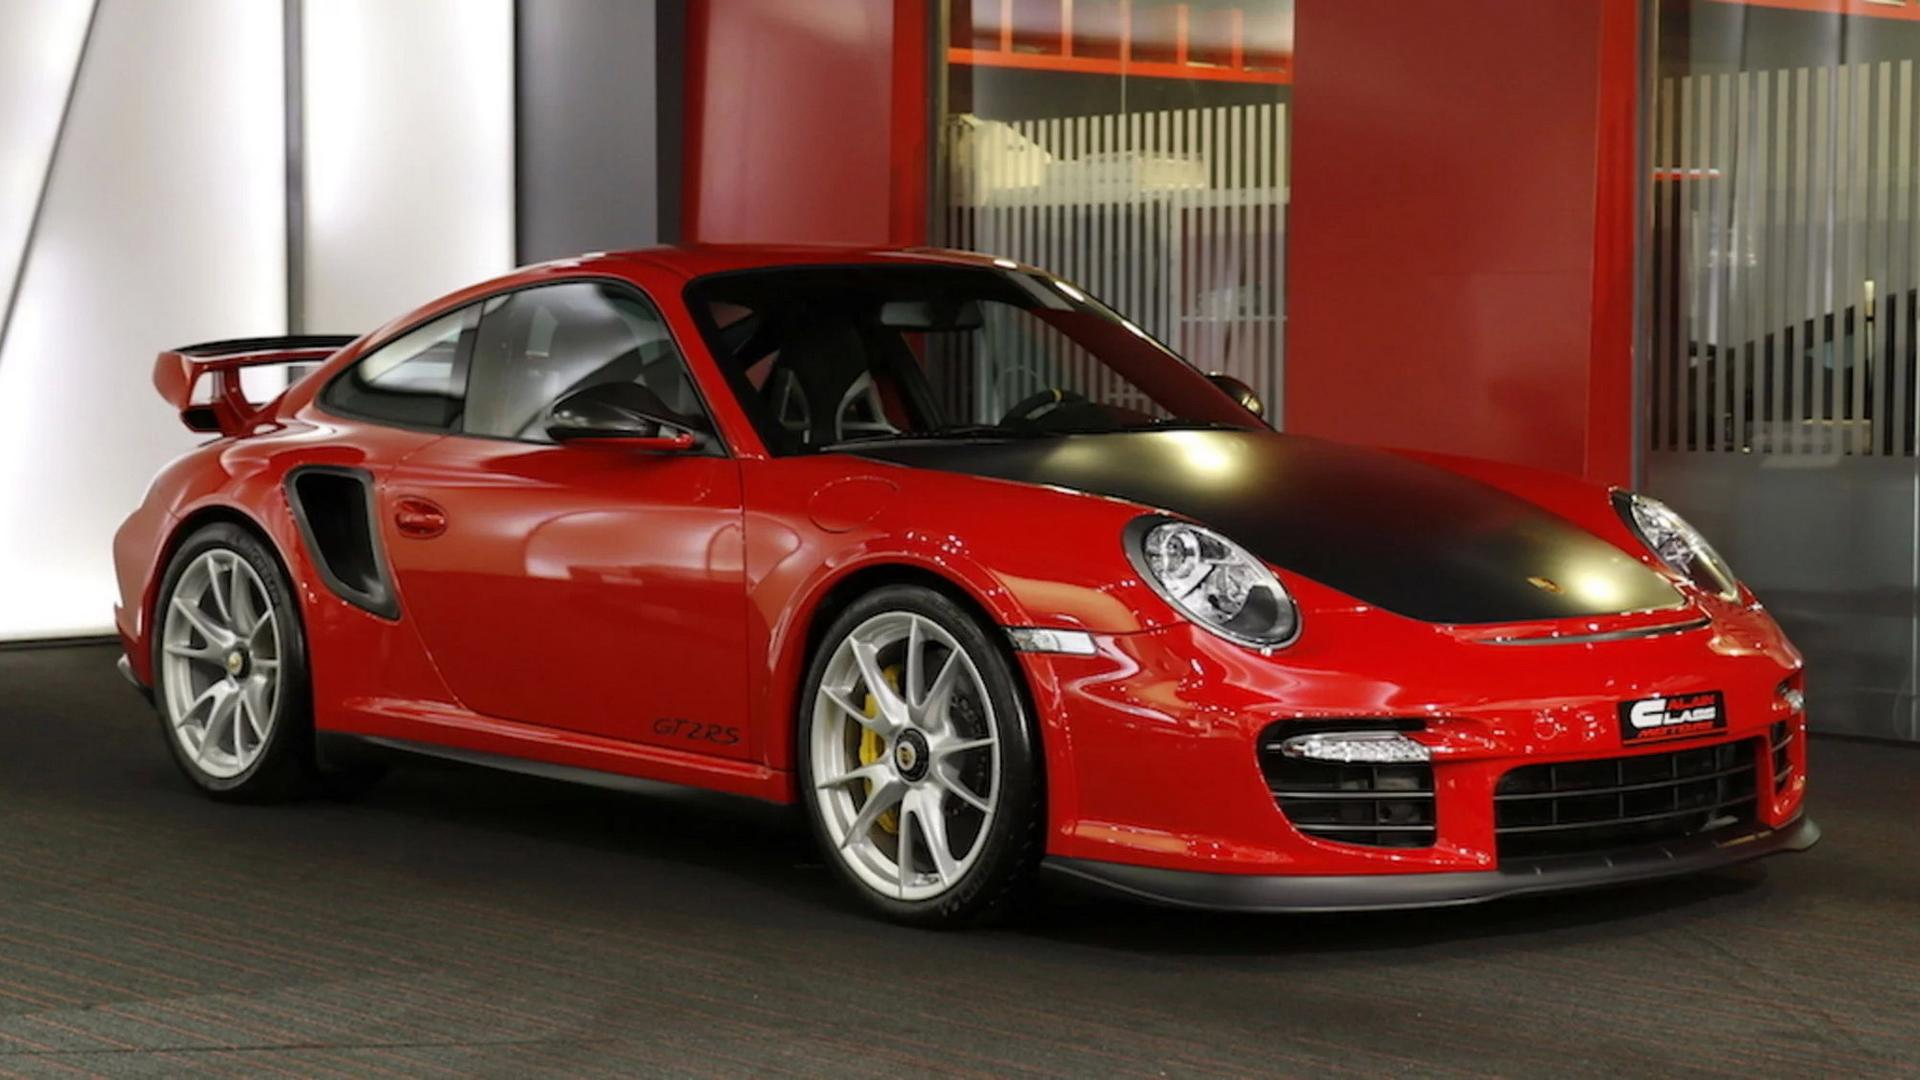 2011-porsche-911-gt2-rs Amazing Porsche 911 Gt2 Rs Engine Cars Trend